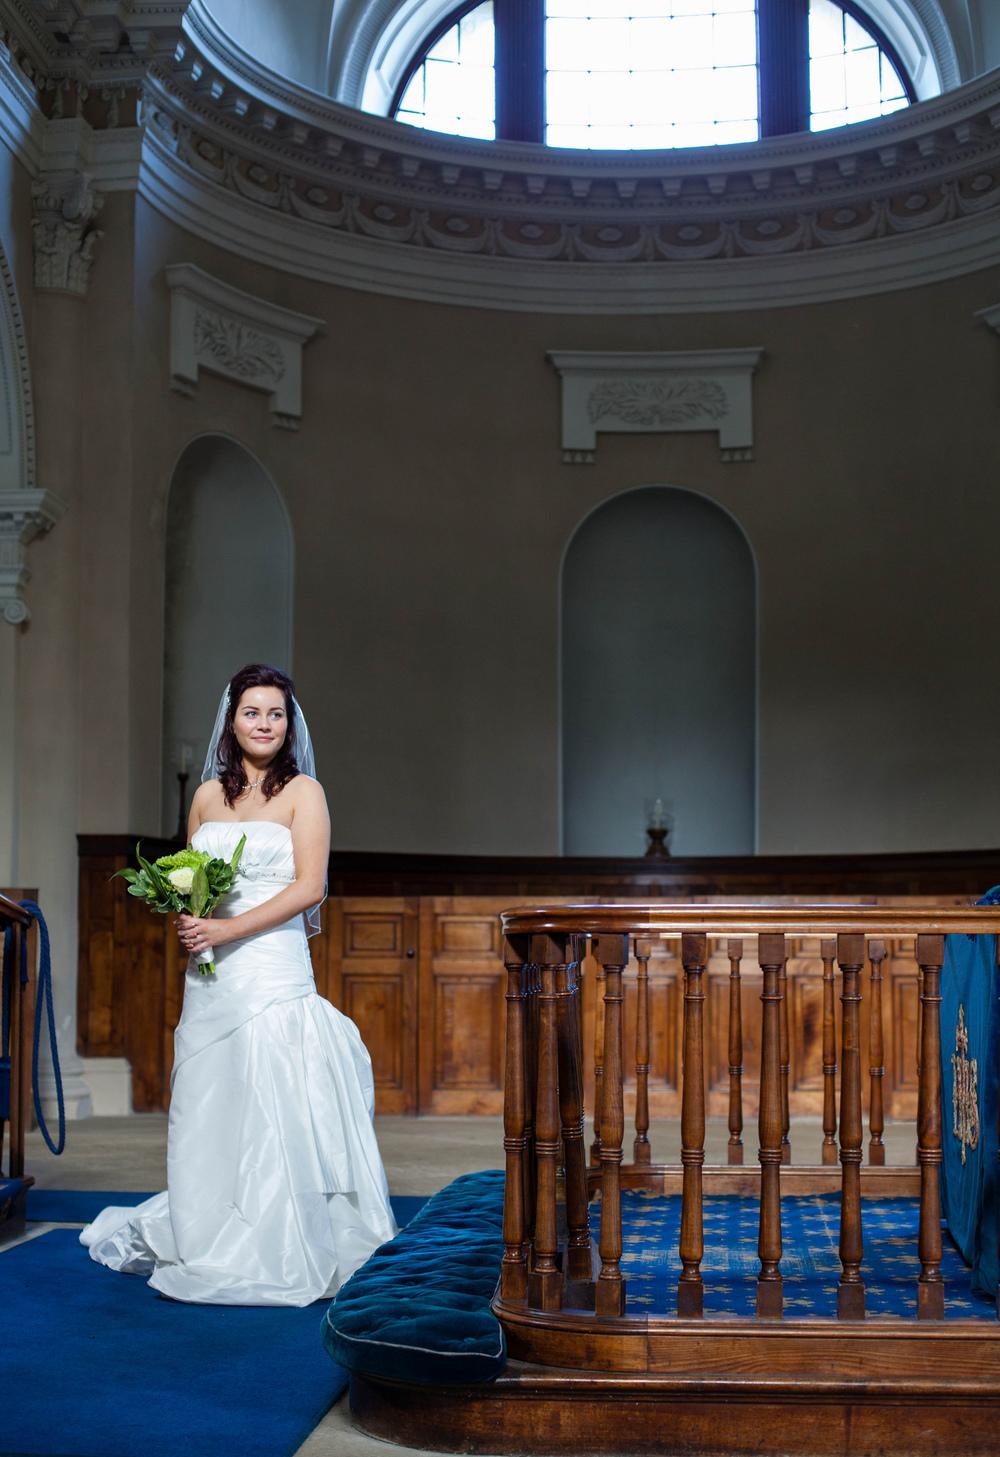 Gibside Chapel Wedding Internal